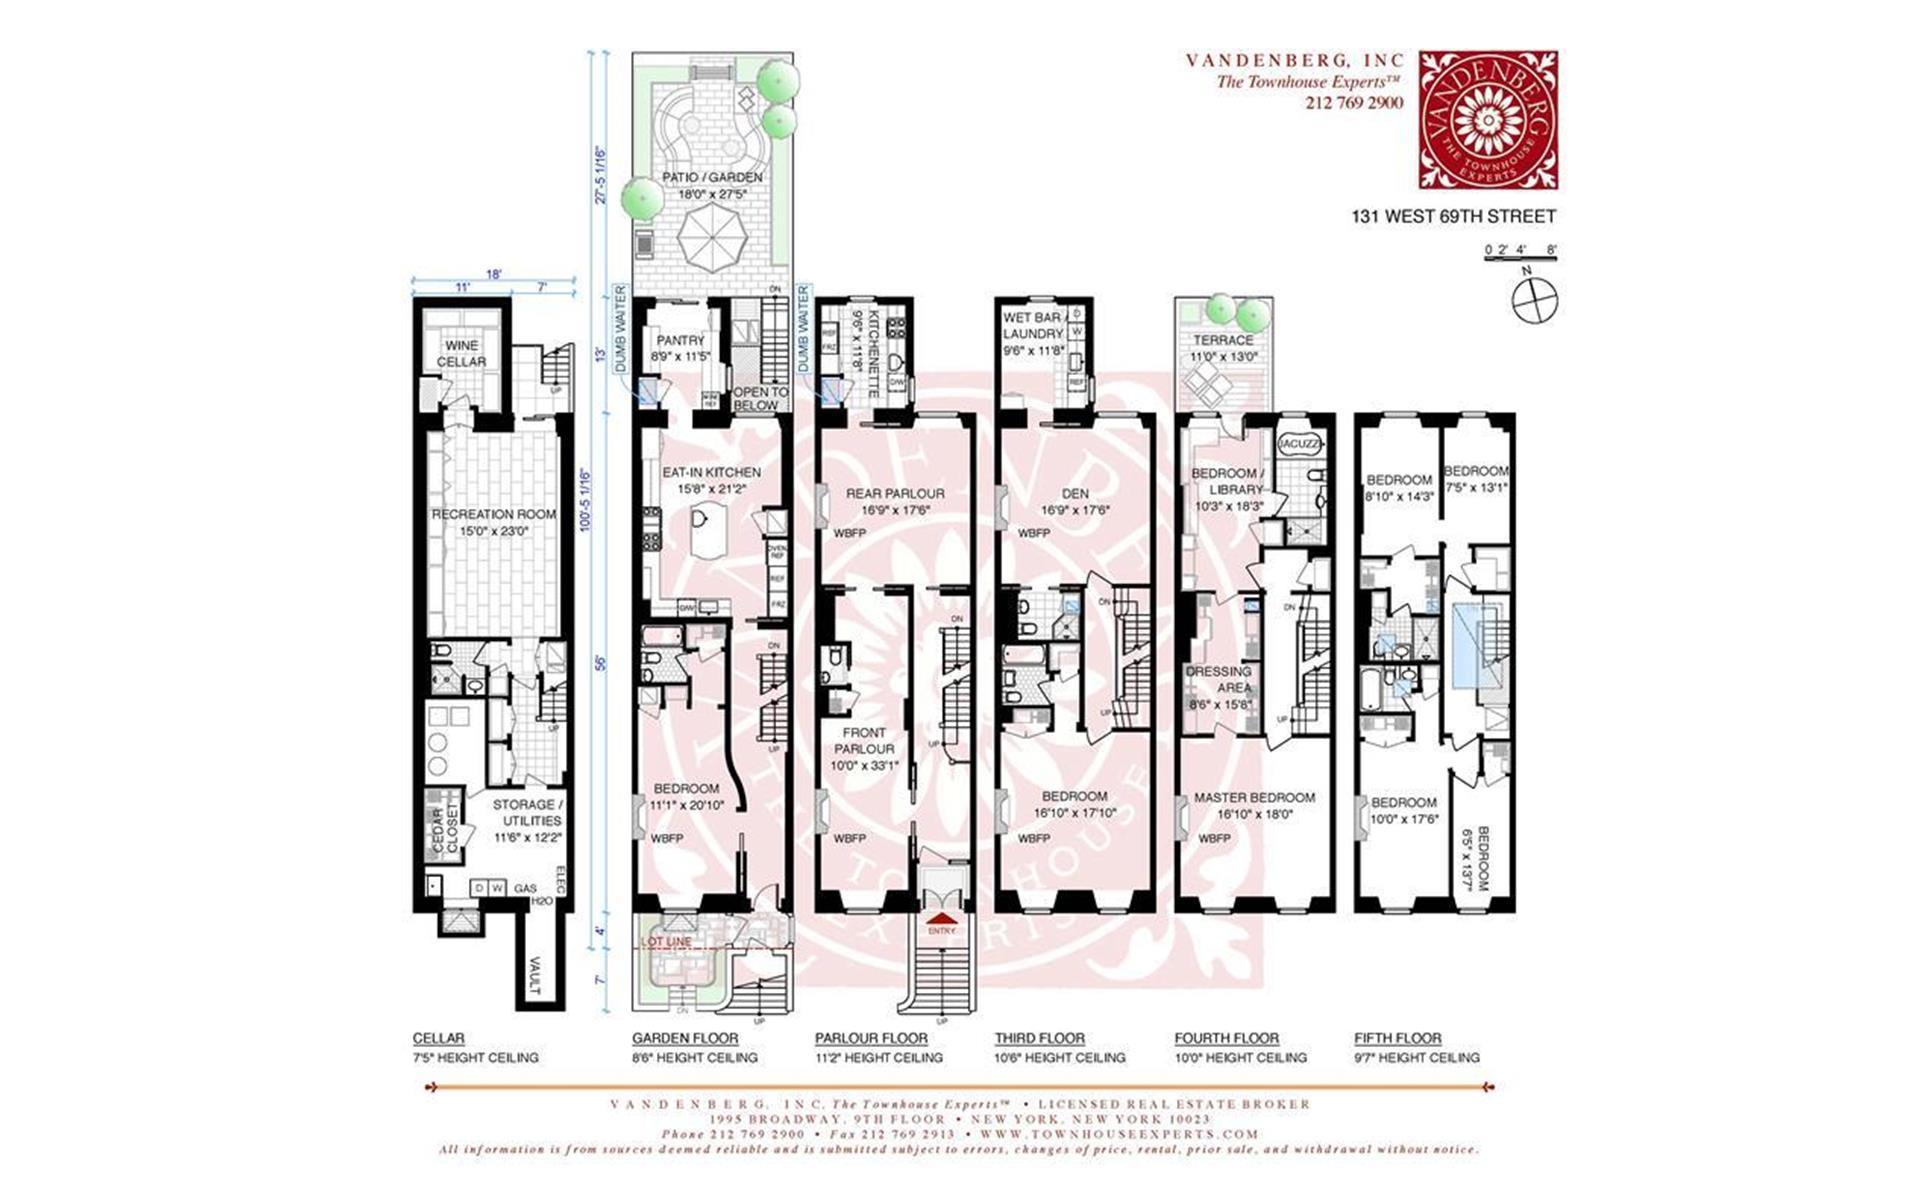 Floor plan of 131 West 69th Street - Upper West Side, New York